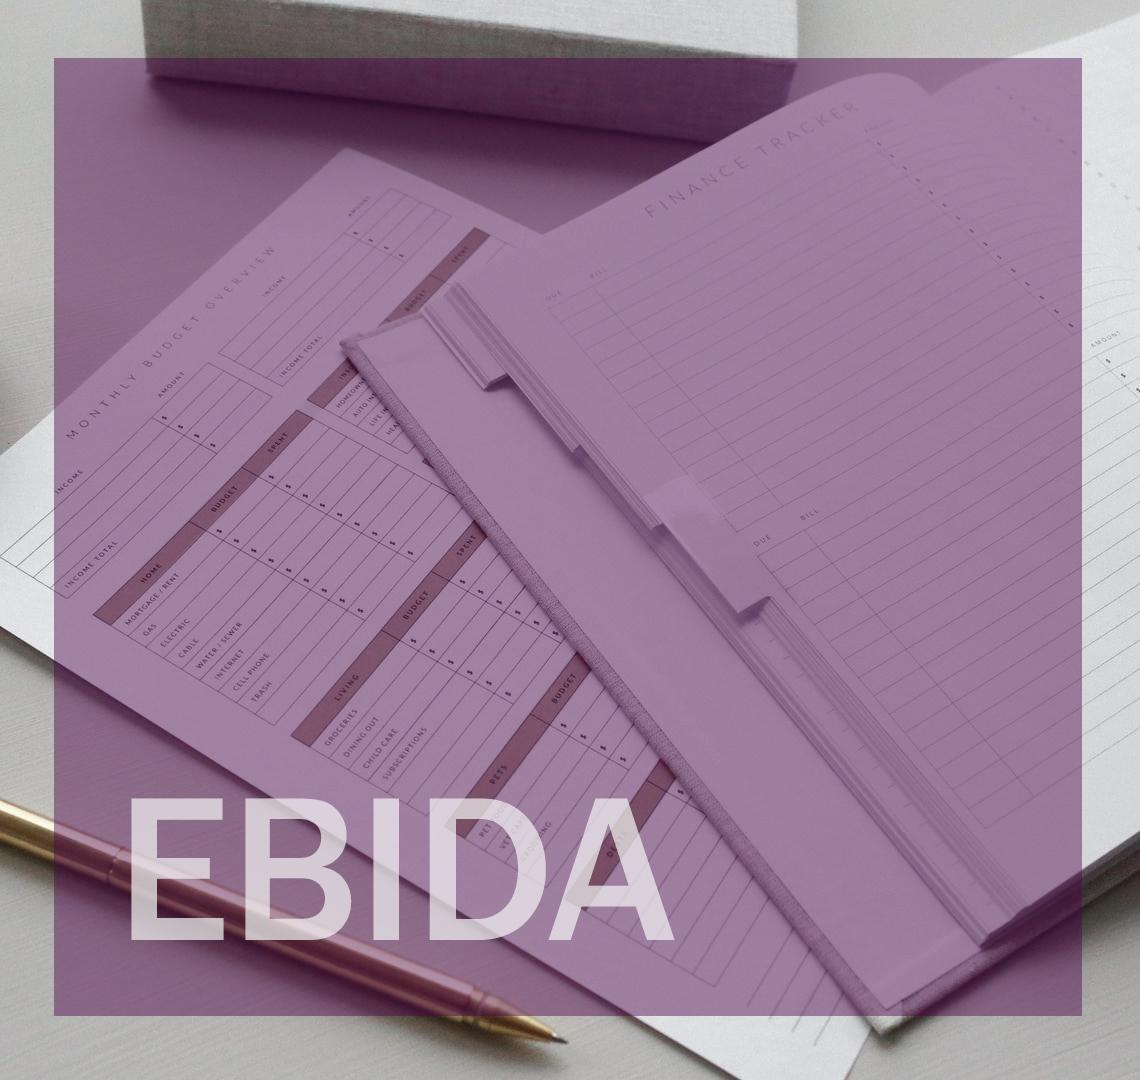 Earnings Before Interest Depreciation and Amortization/EBIDA